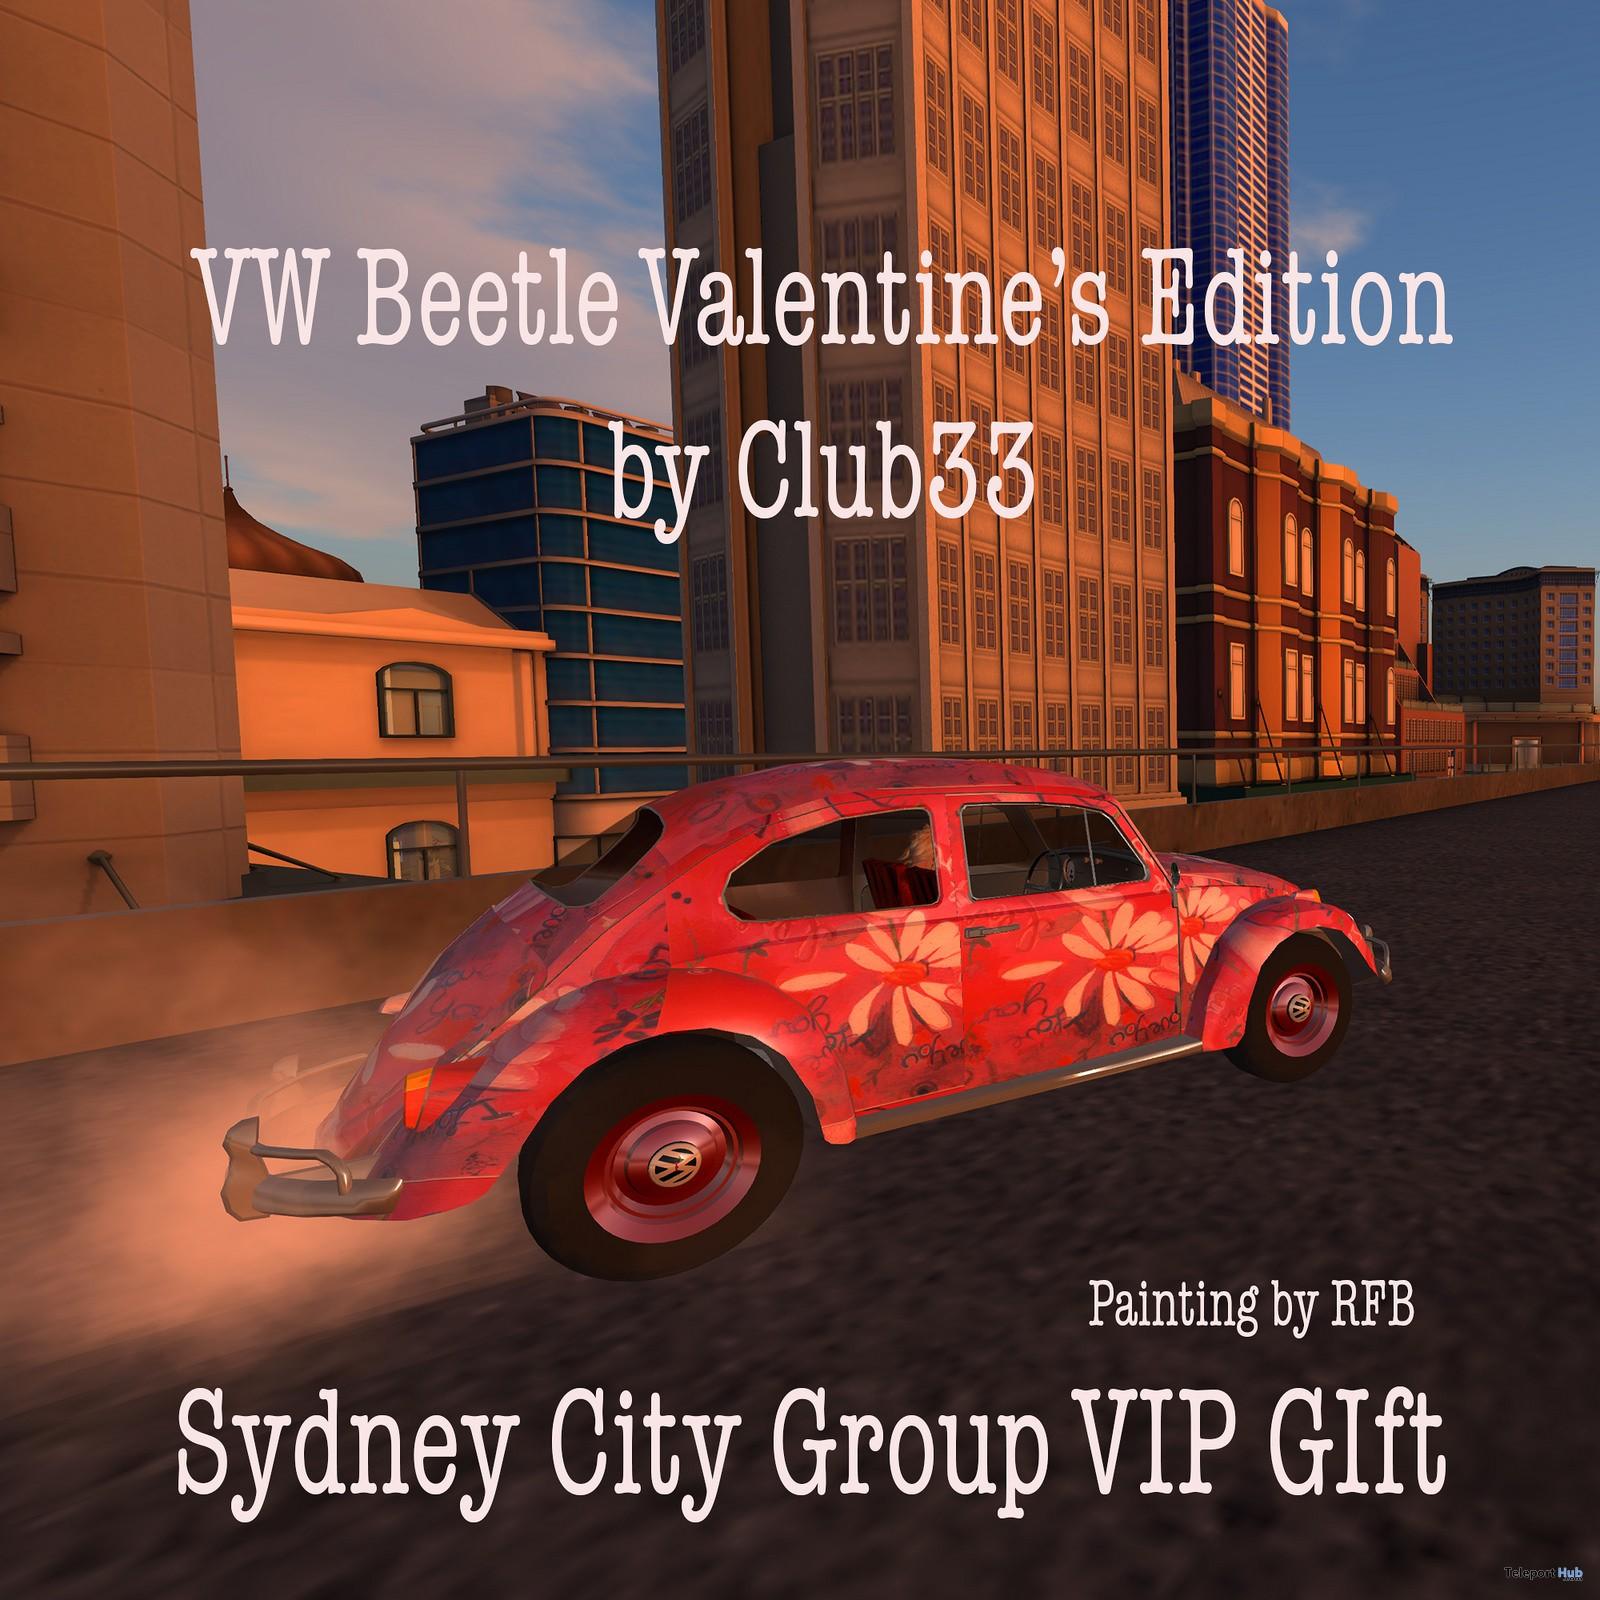 VW Valentines Beetle 1970 Car Sydney City Group Gift by RaC - Teleport Hub - teleporthub.com